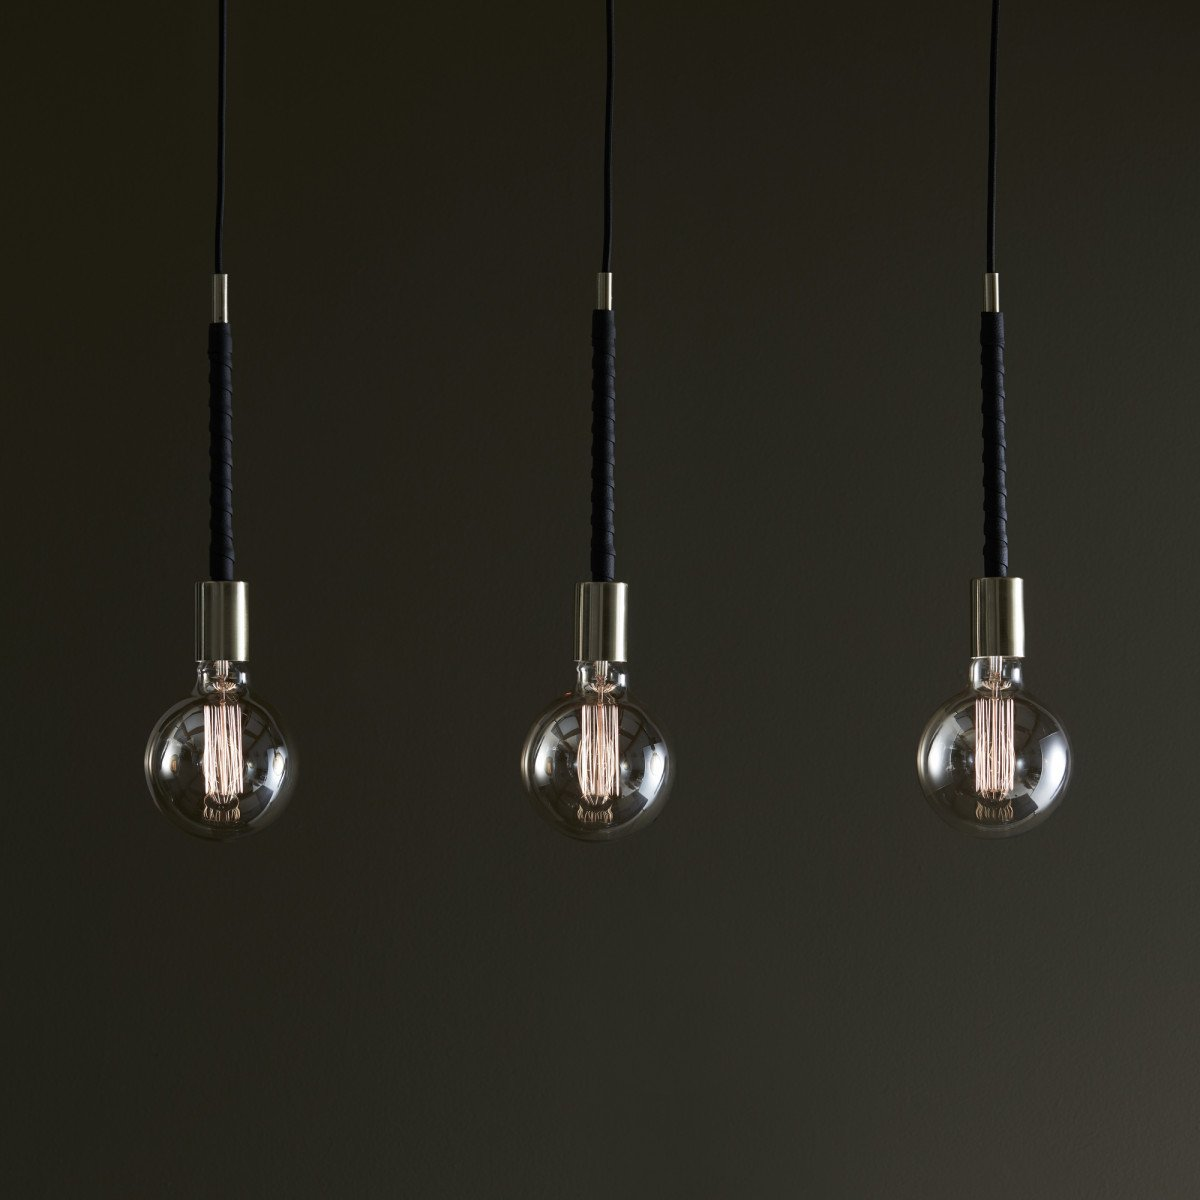 Hanglamp Saddle Straight 3-lichts messing